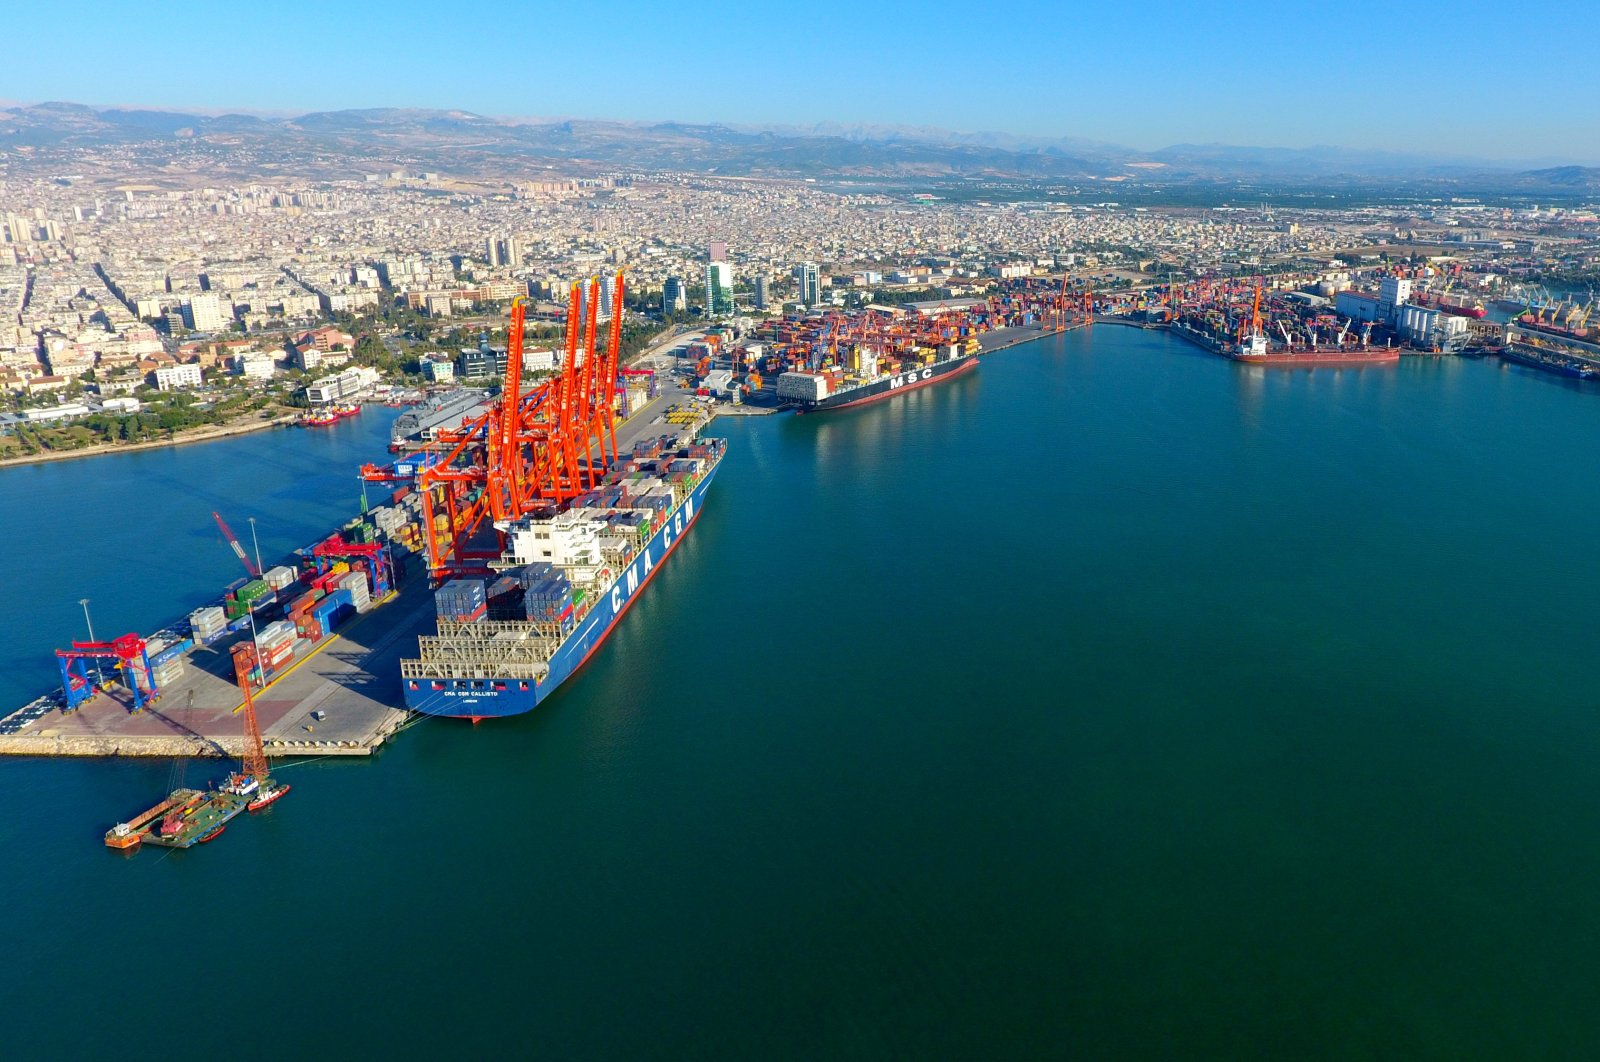 An aerial view of the Port of Mersin on Turkey's Mediterranean coast, July 20, 2019. (IHA Photo)